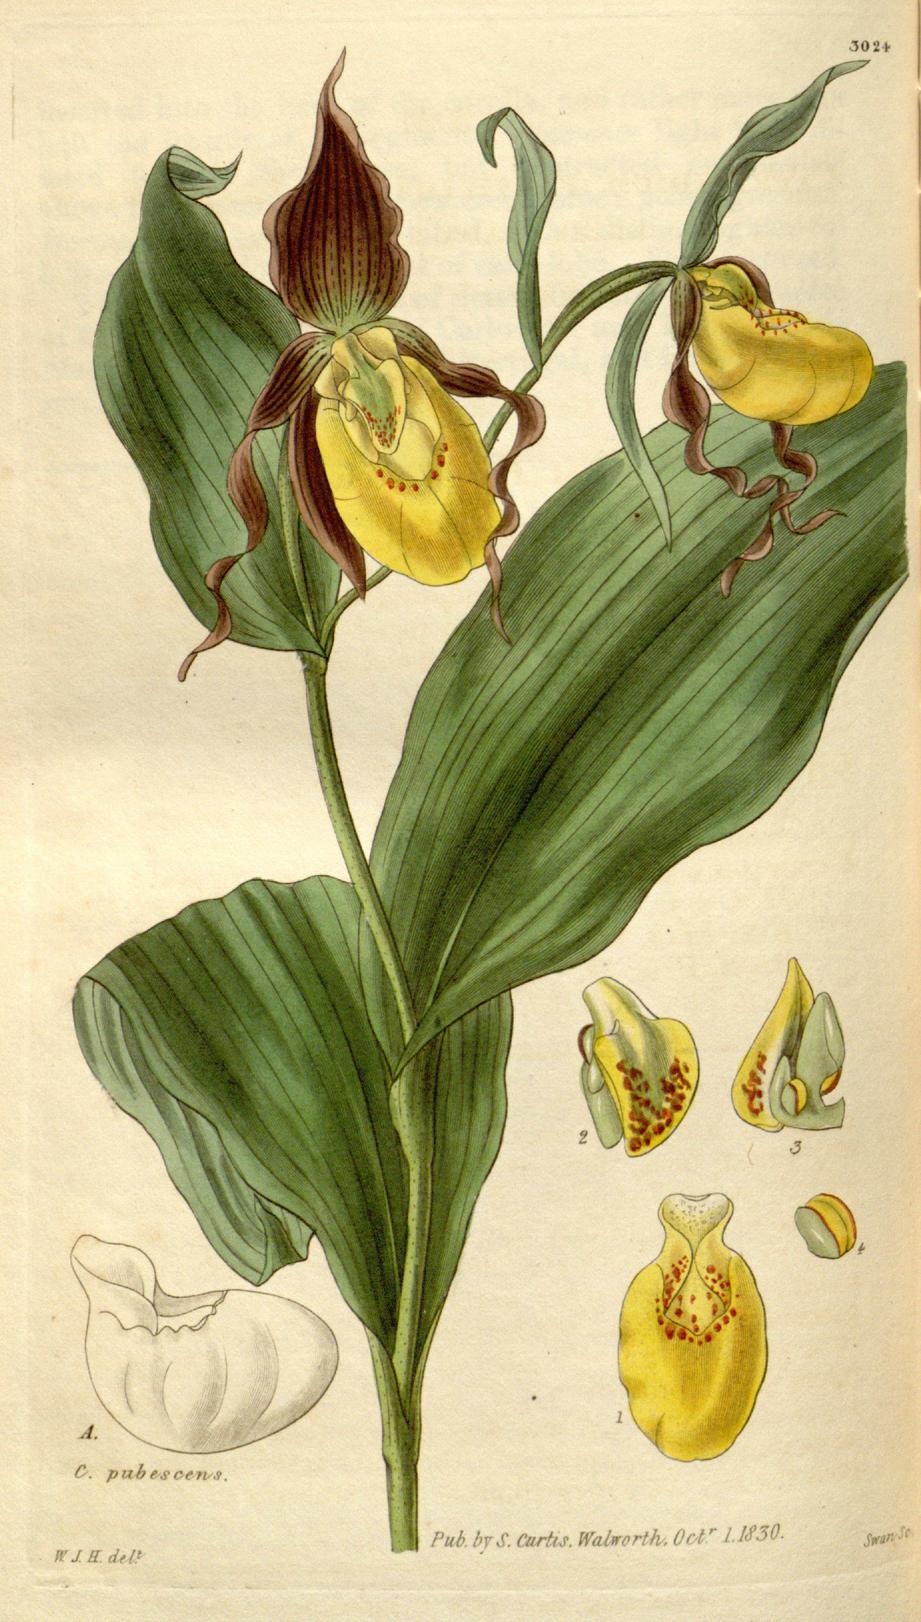 Illustration-of-Lady's-Slipper